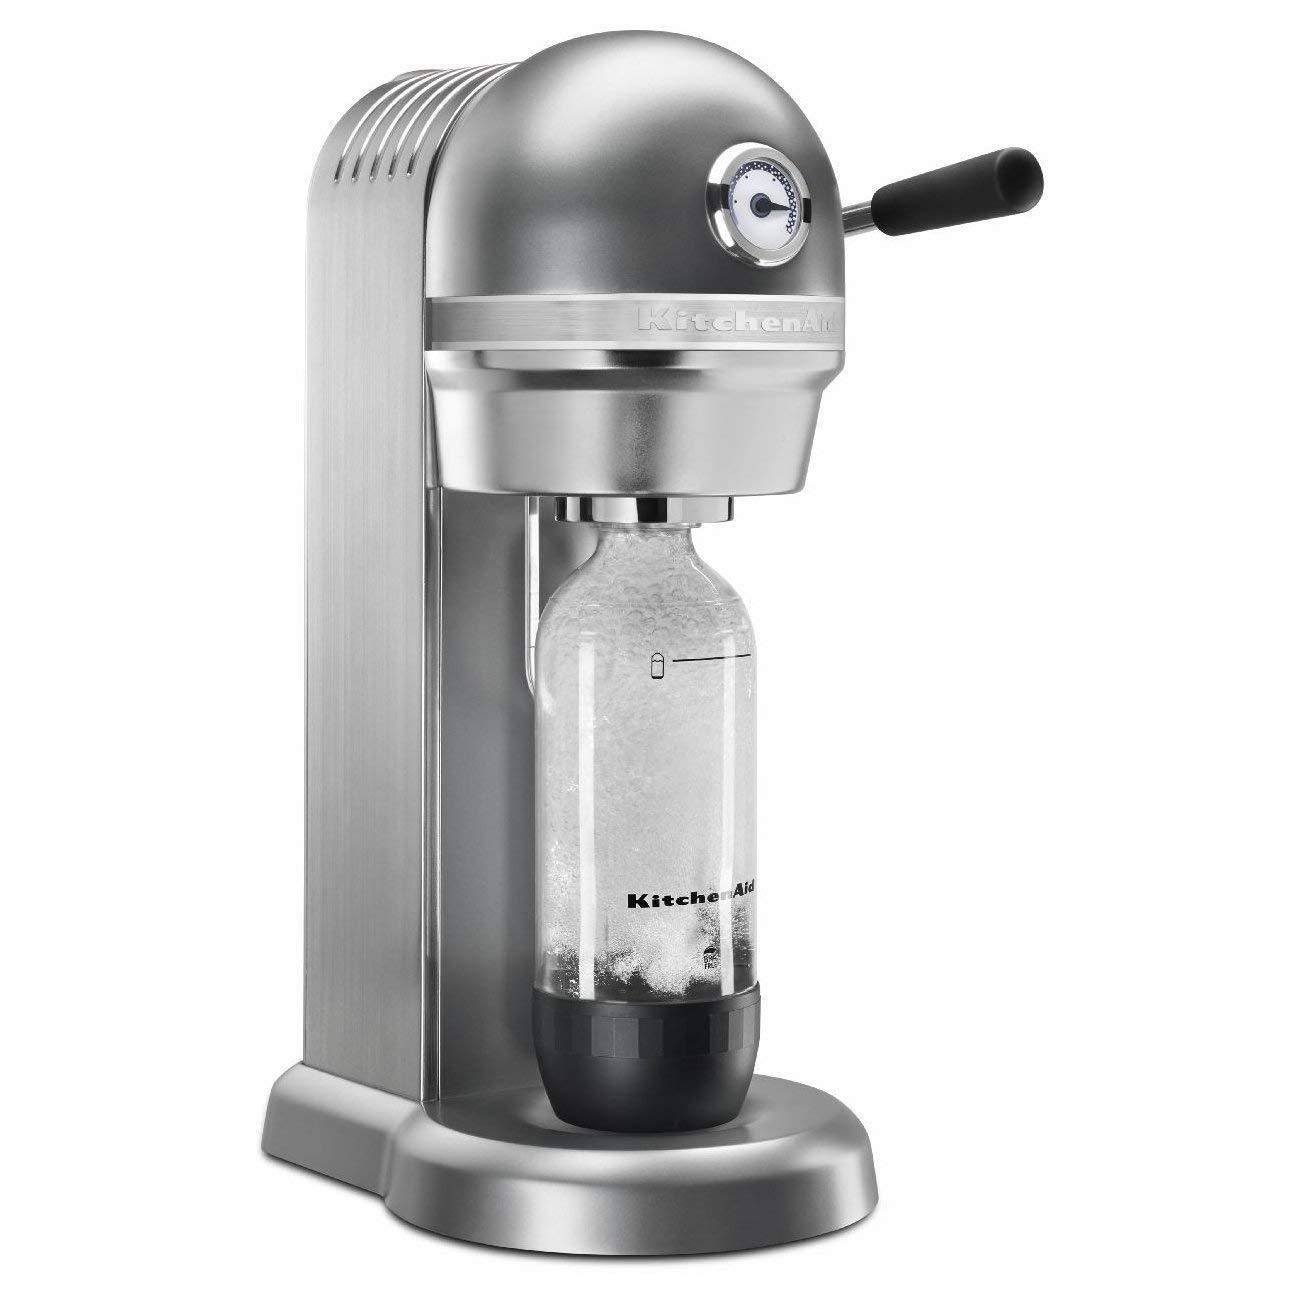 KitchenAid RKSS1121CU Sparkling Beverage Maker Renewed Contour Silver